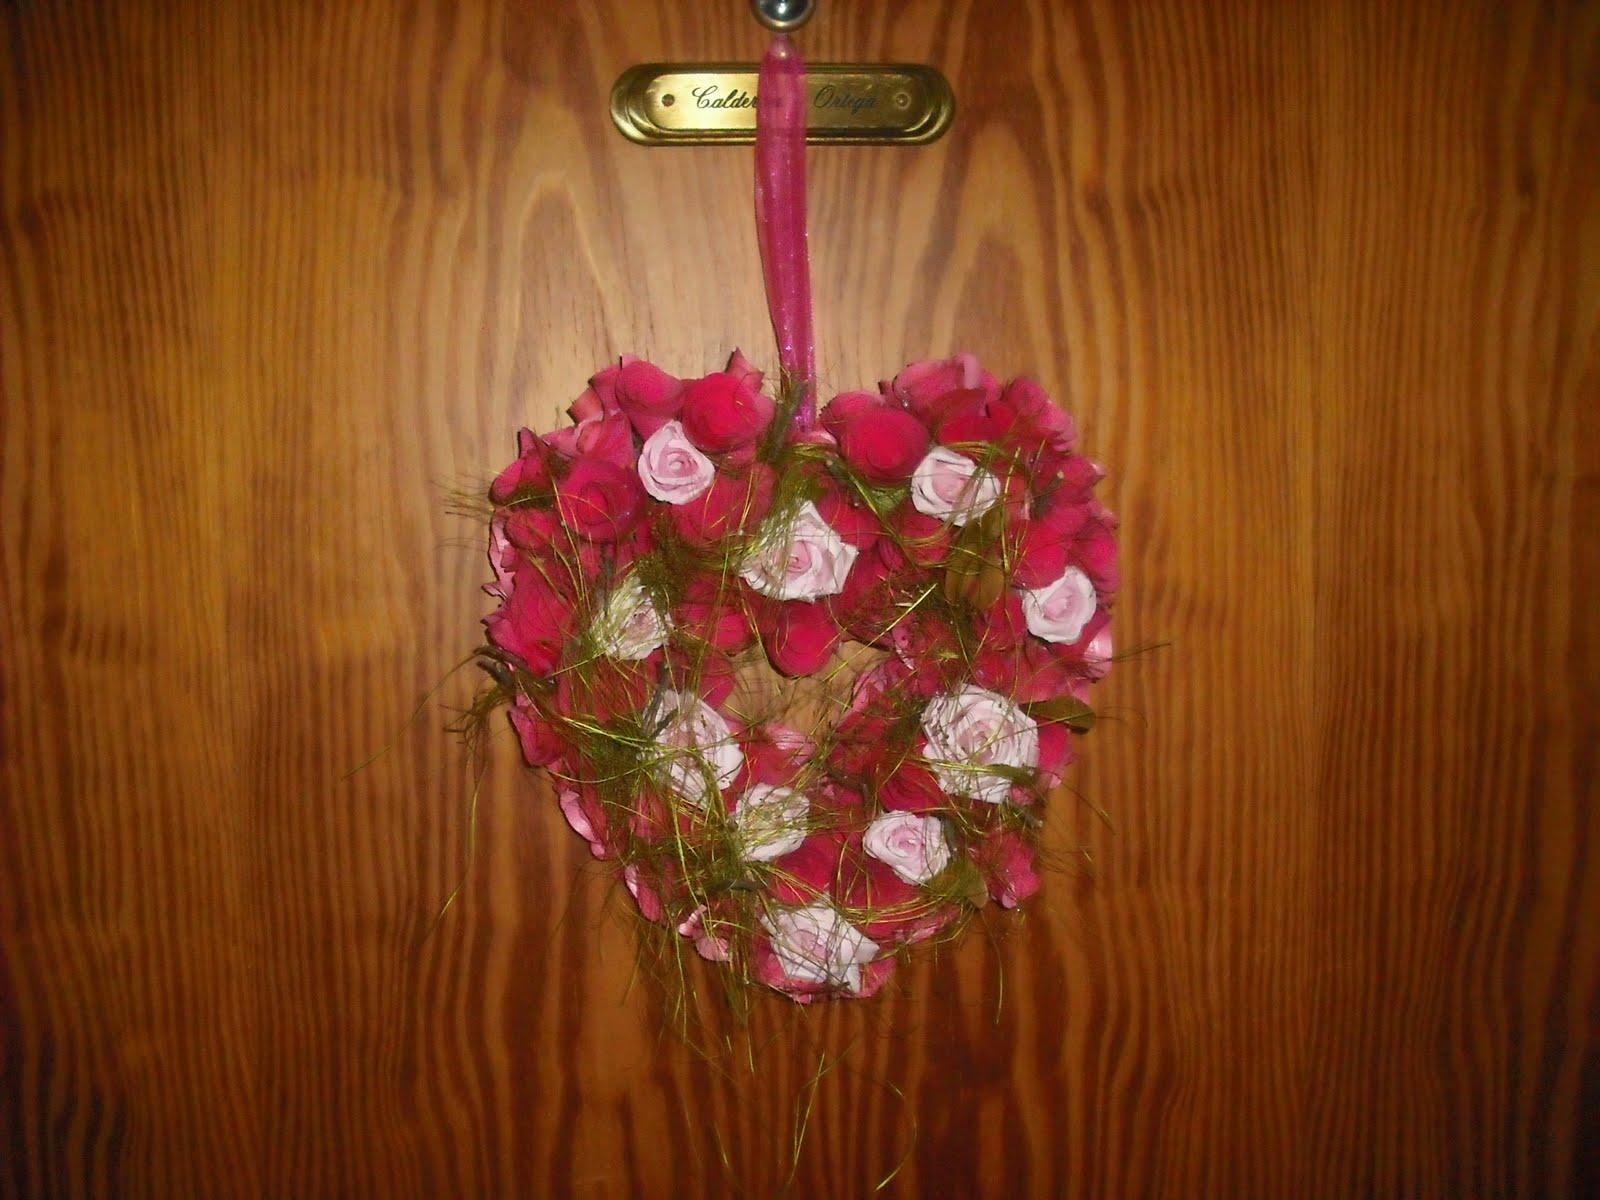 Abanic arte corona navide a para la puerta - Coronas navidenas para puertas ...